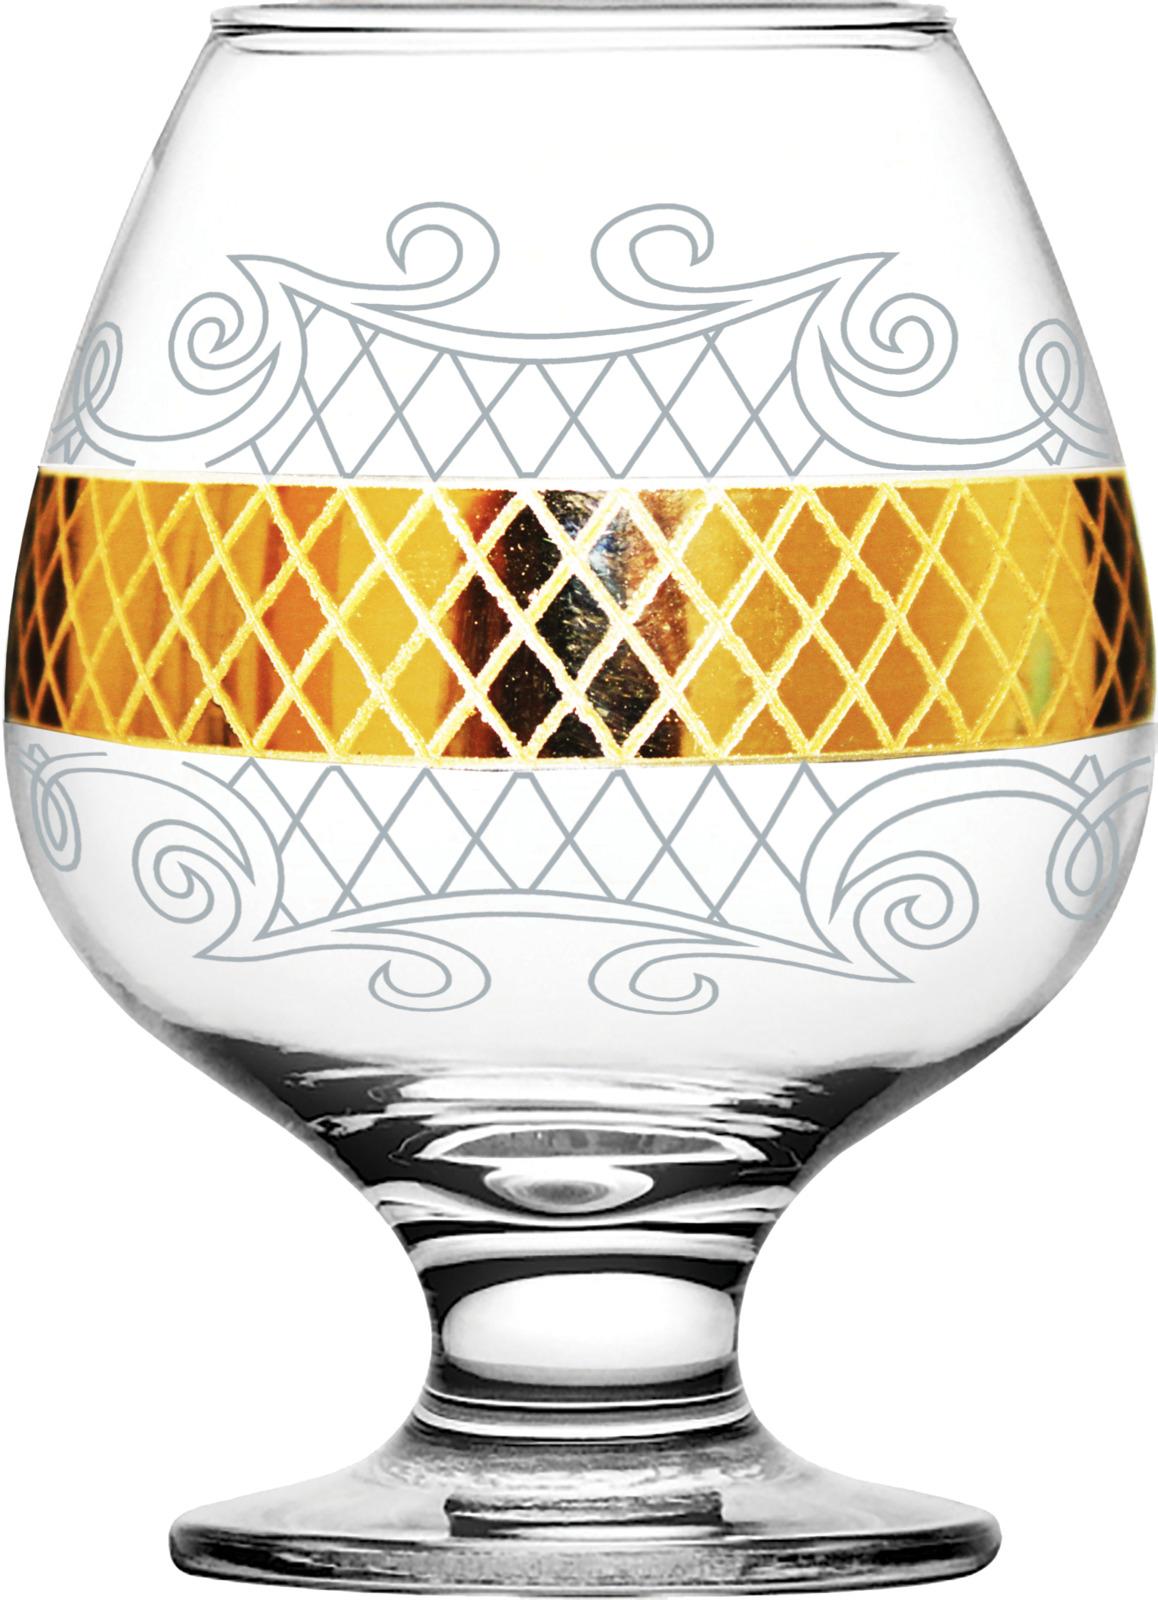 Набор бокалов для бренди Гусь-Хрустальный Винтаж, EAV25-188, 400 мл, 6 шт набор бокалов гусь хрустальный золотой карат